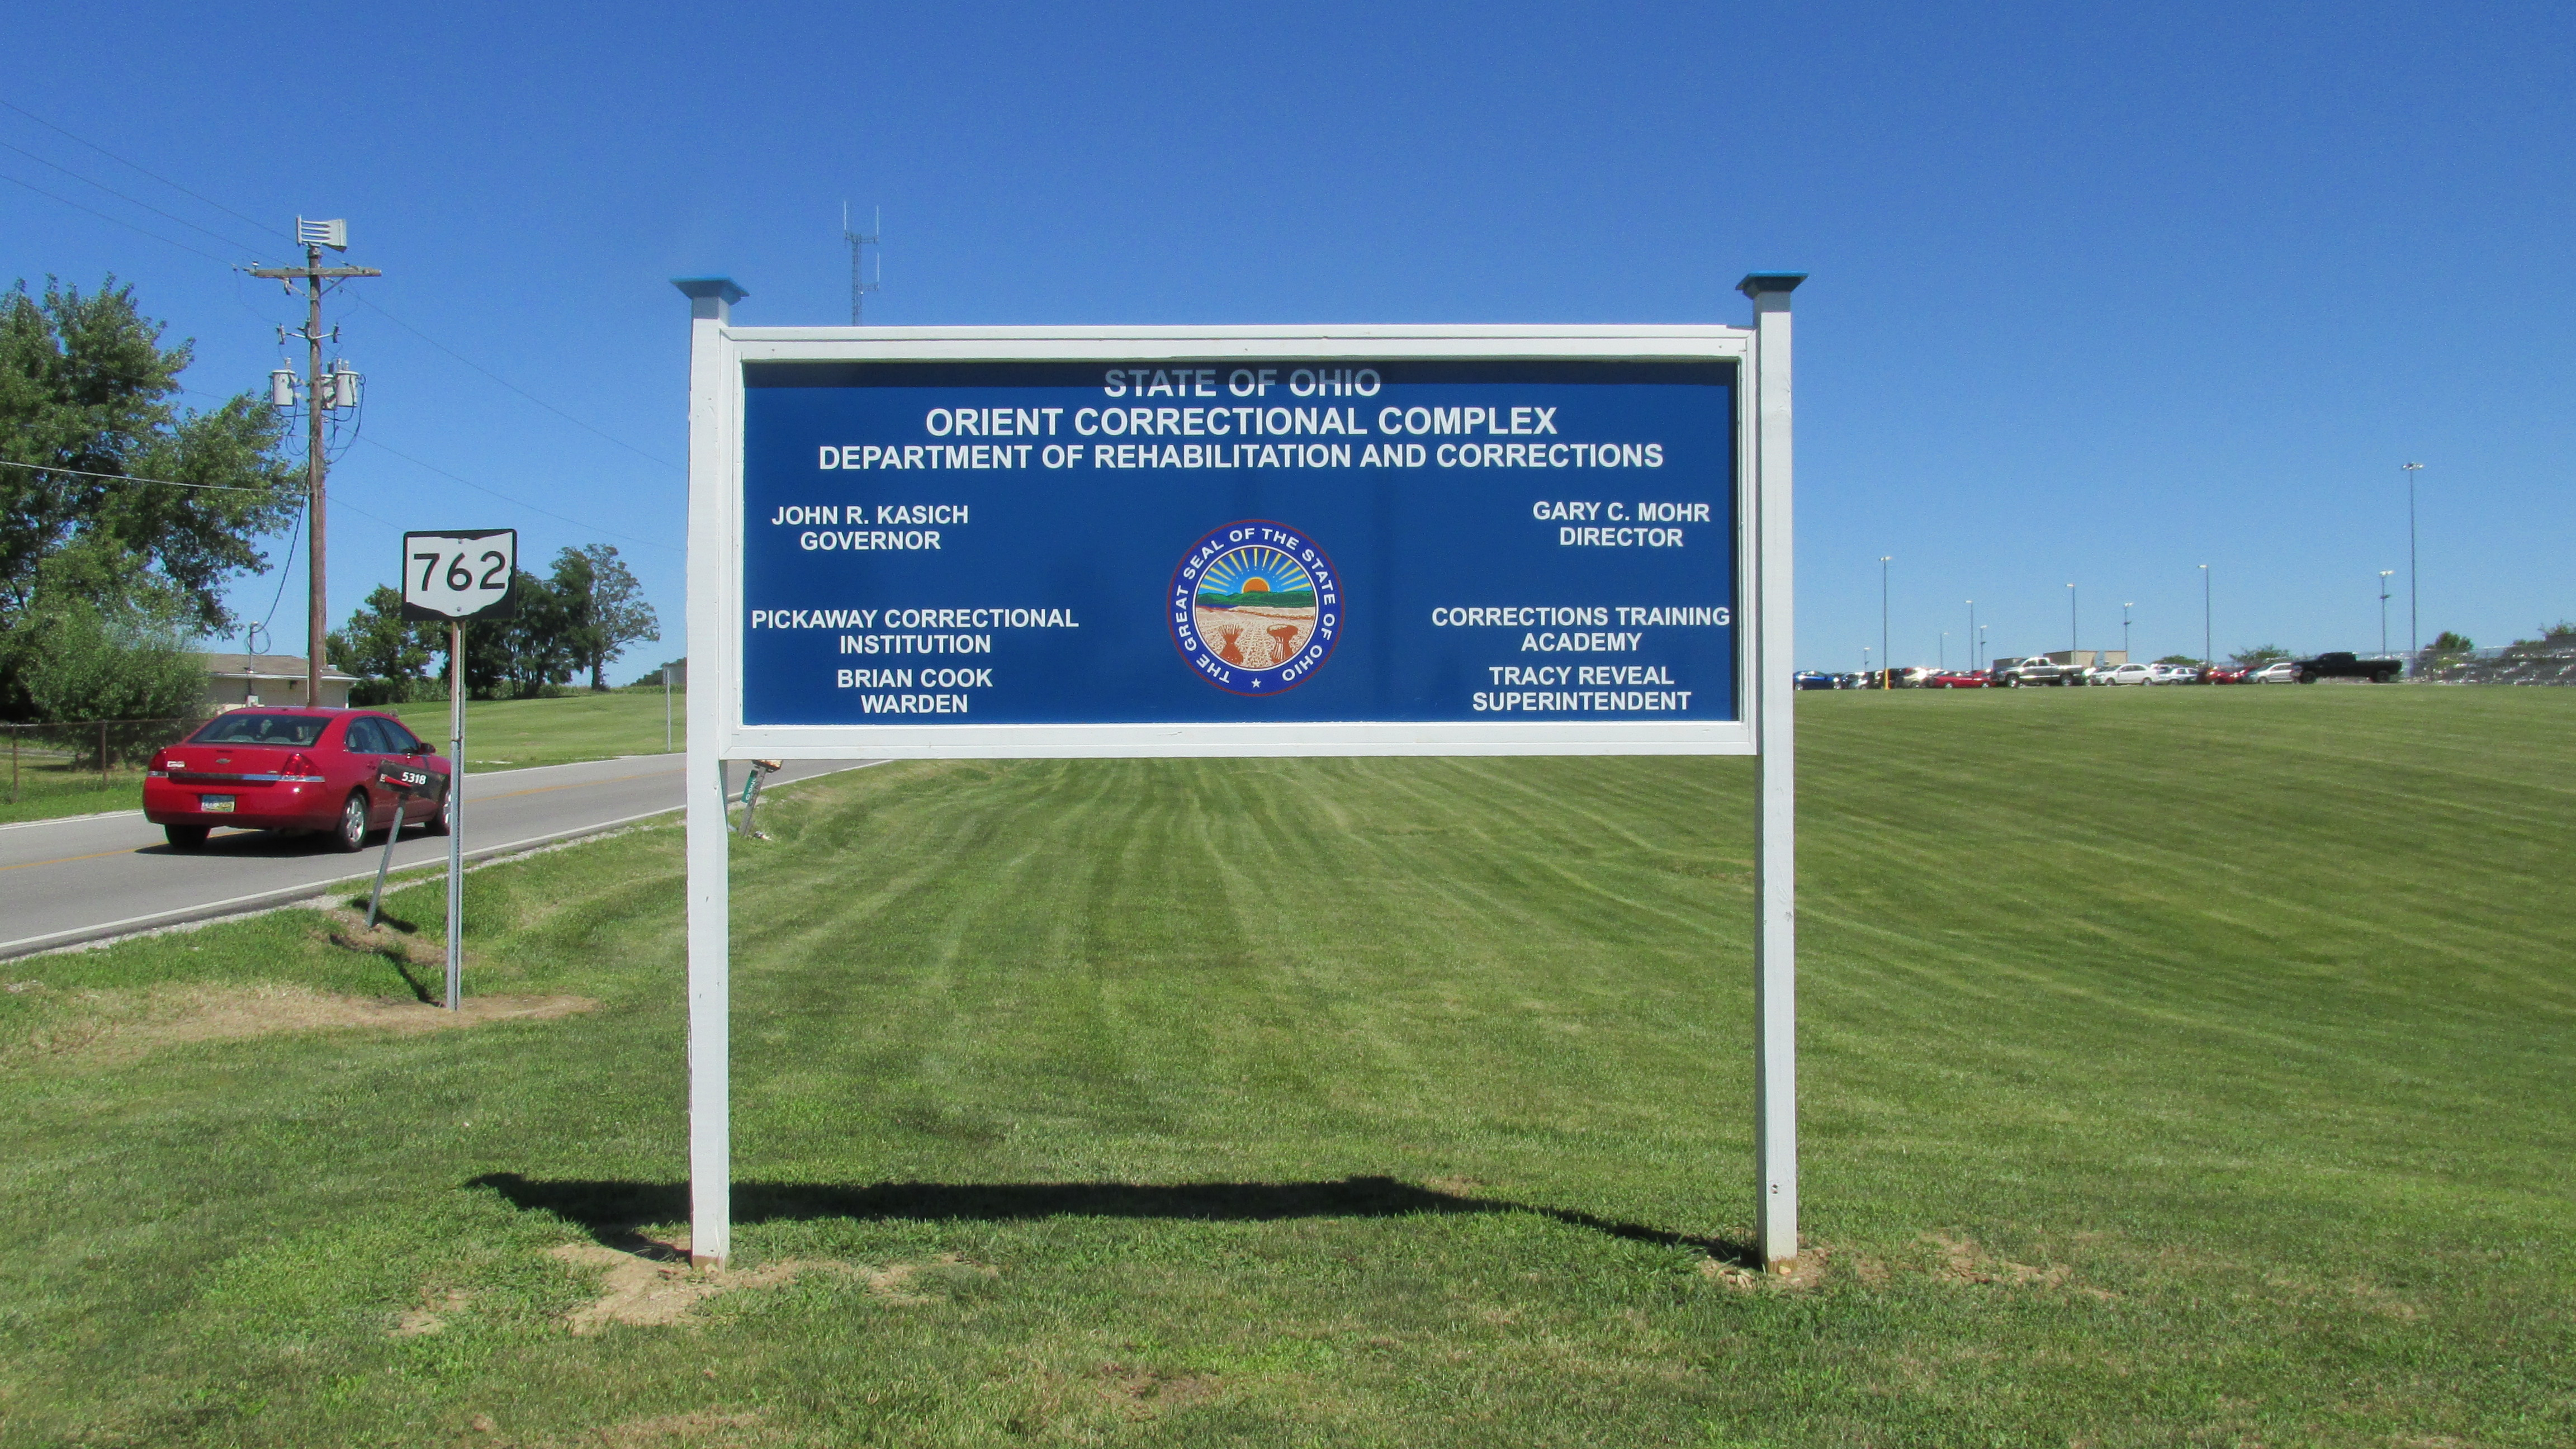 Pickaway Correctional Institution - Wikipedia